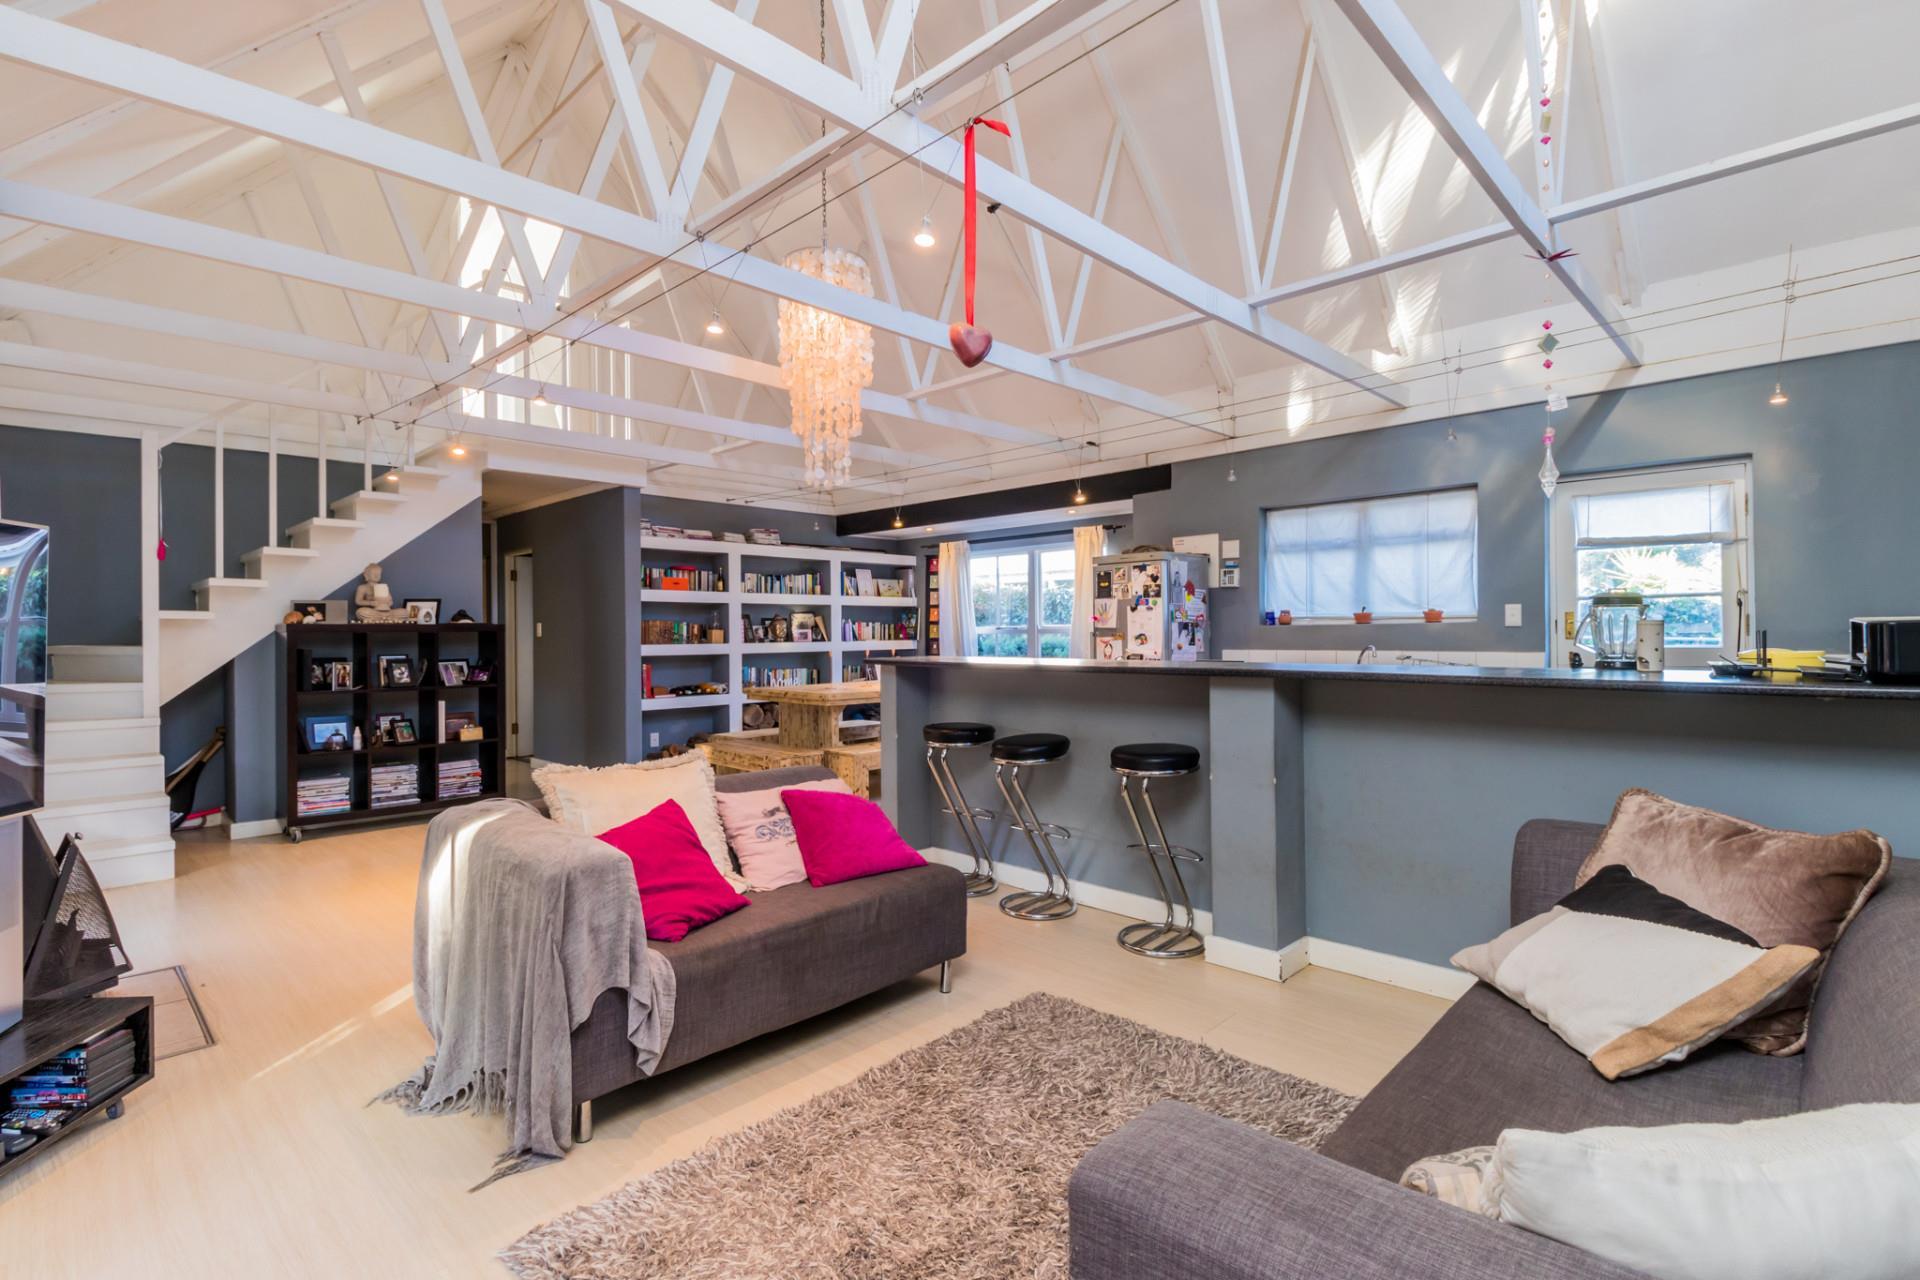 4 Bedroom House For Sale in Scott Estate